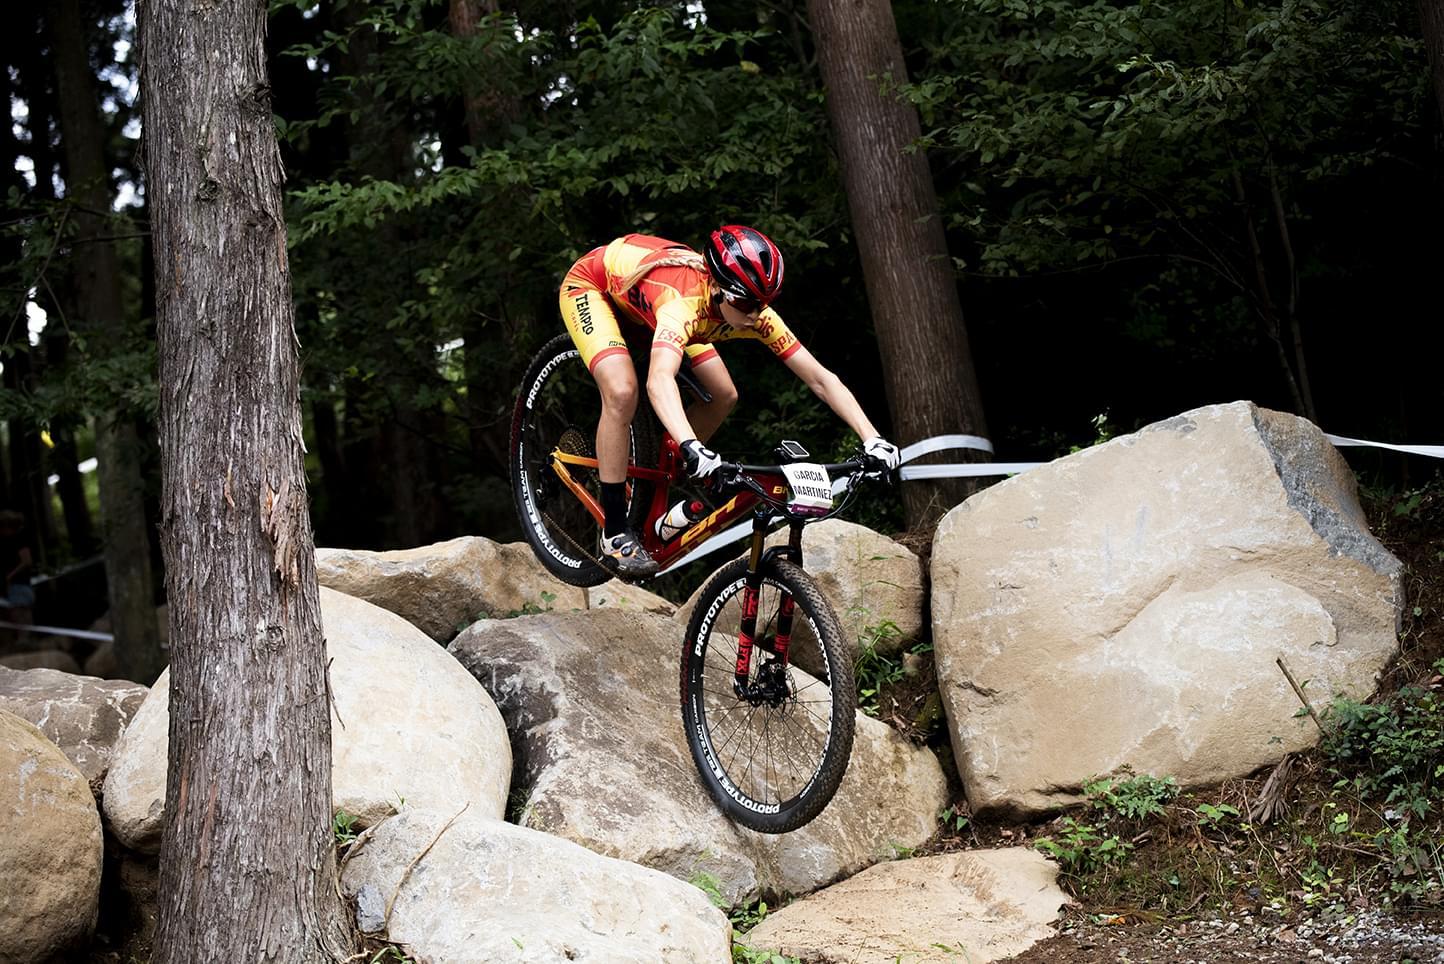 #TeamESPciclismo / Test Olímpico Tokio 2020 (Fotos: Silvia Fernández)